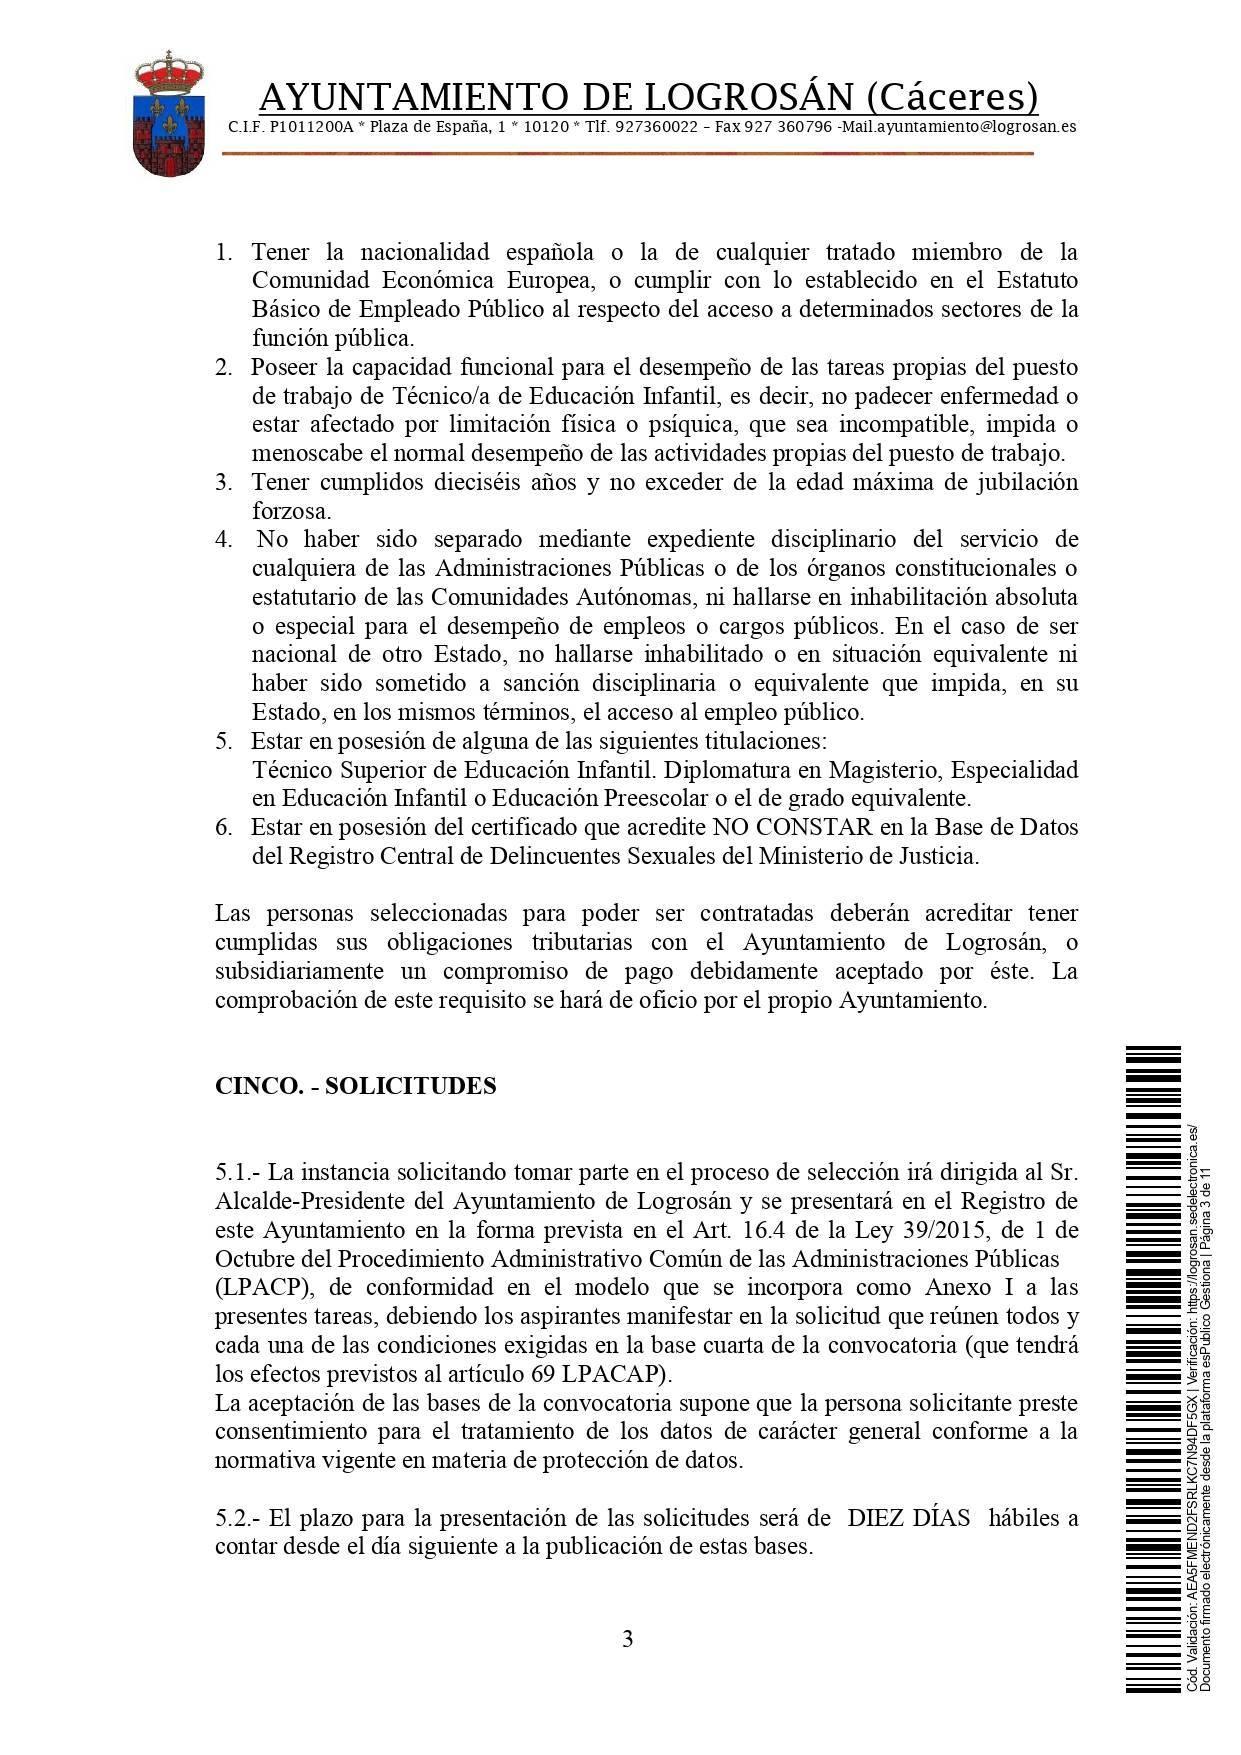 Bolsa de técnicos-as en educación infantil (2021) - Logrosán (Cáceres) 3